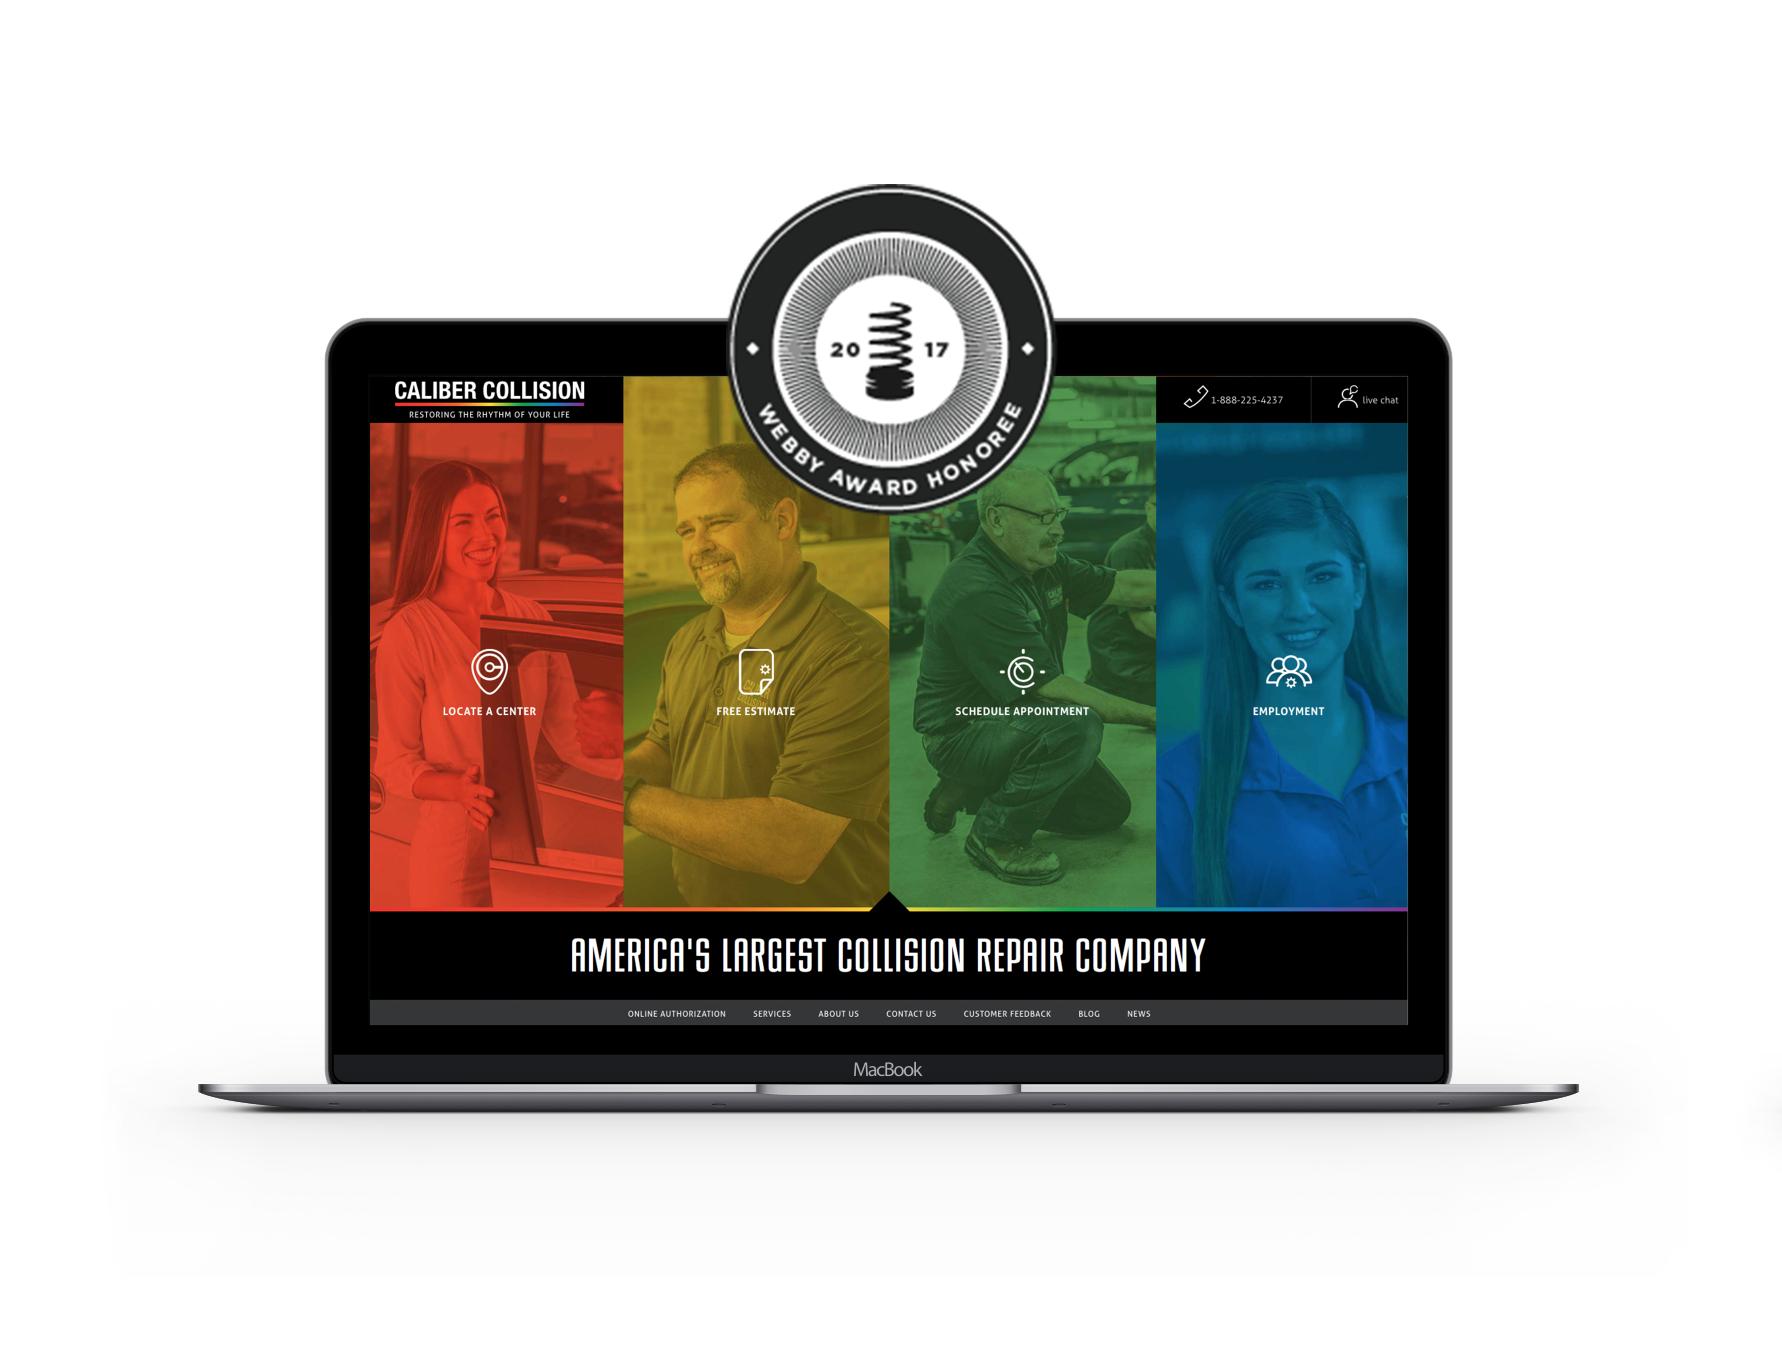 Caliber Collision Webby Award Honoree